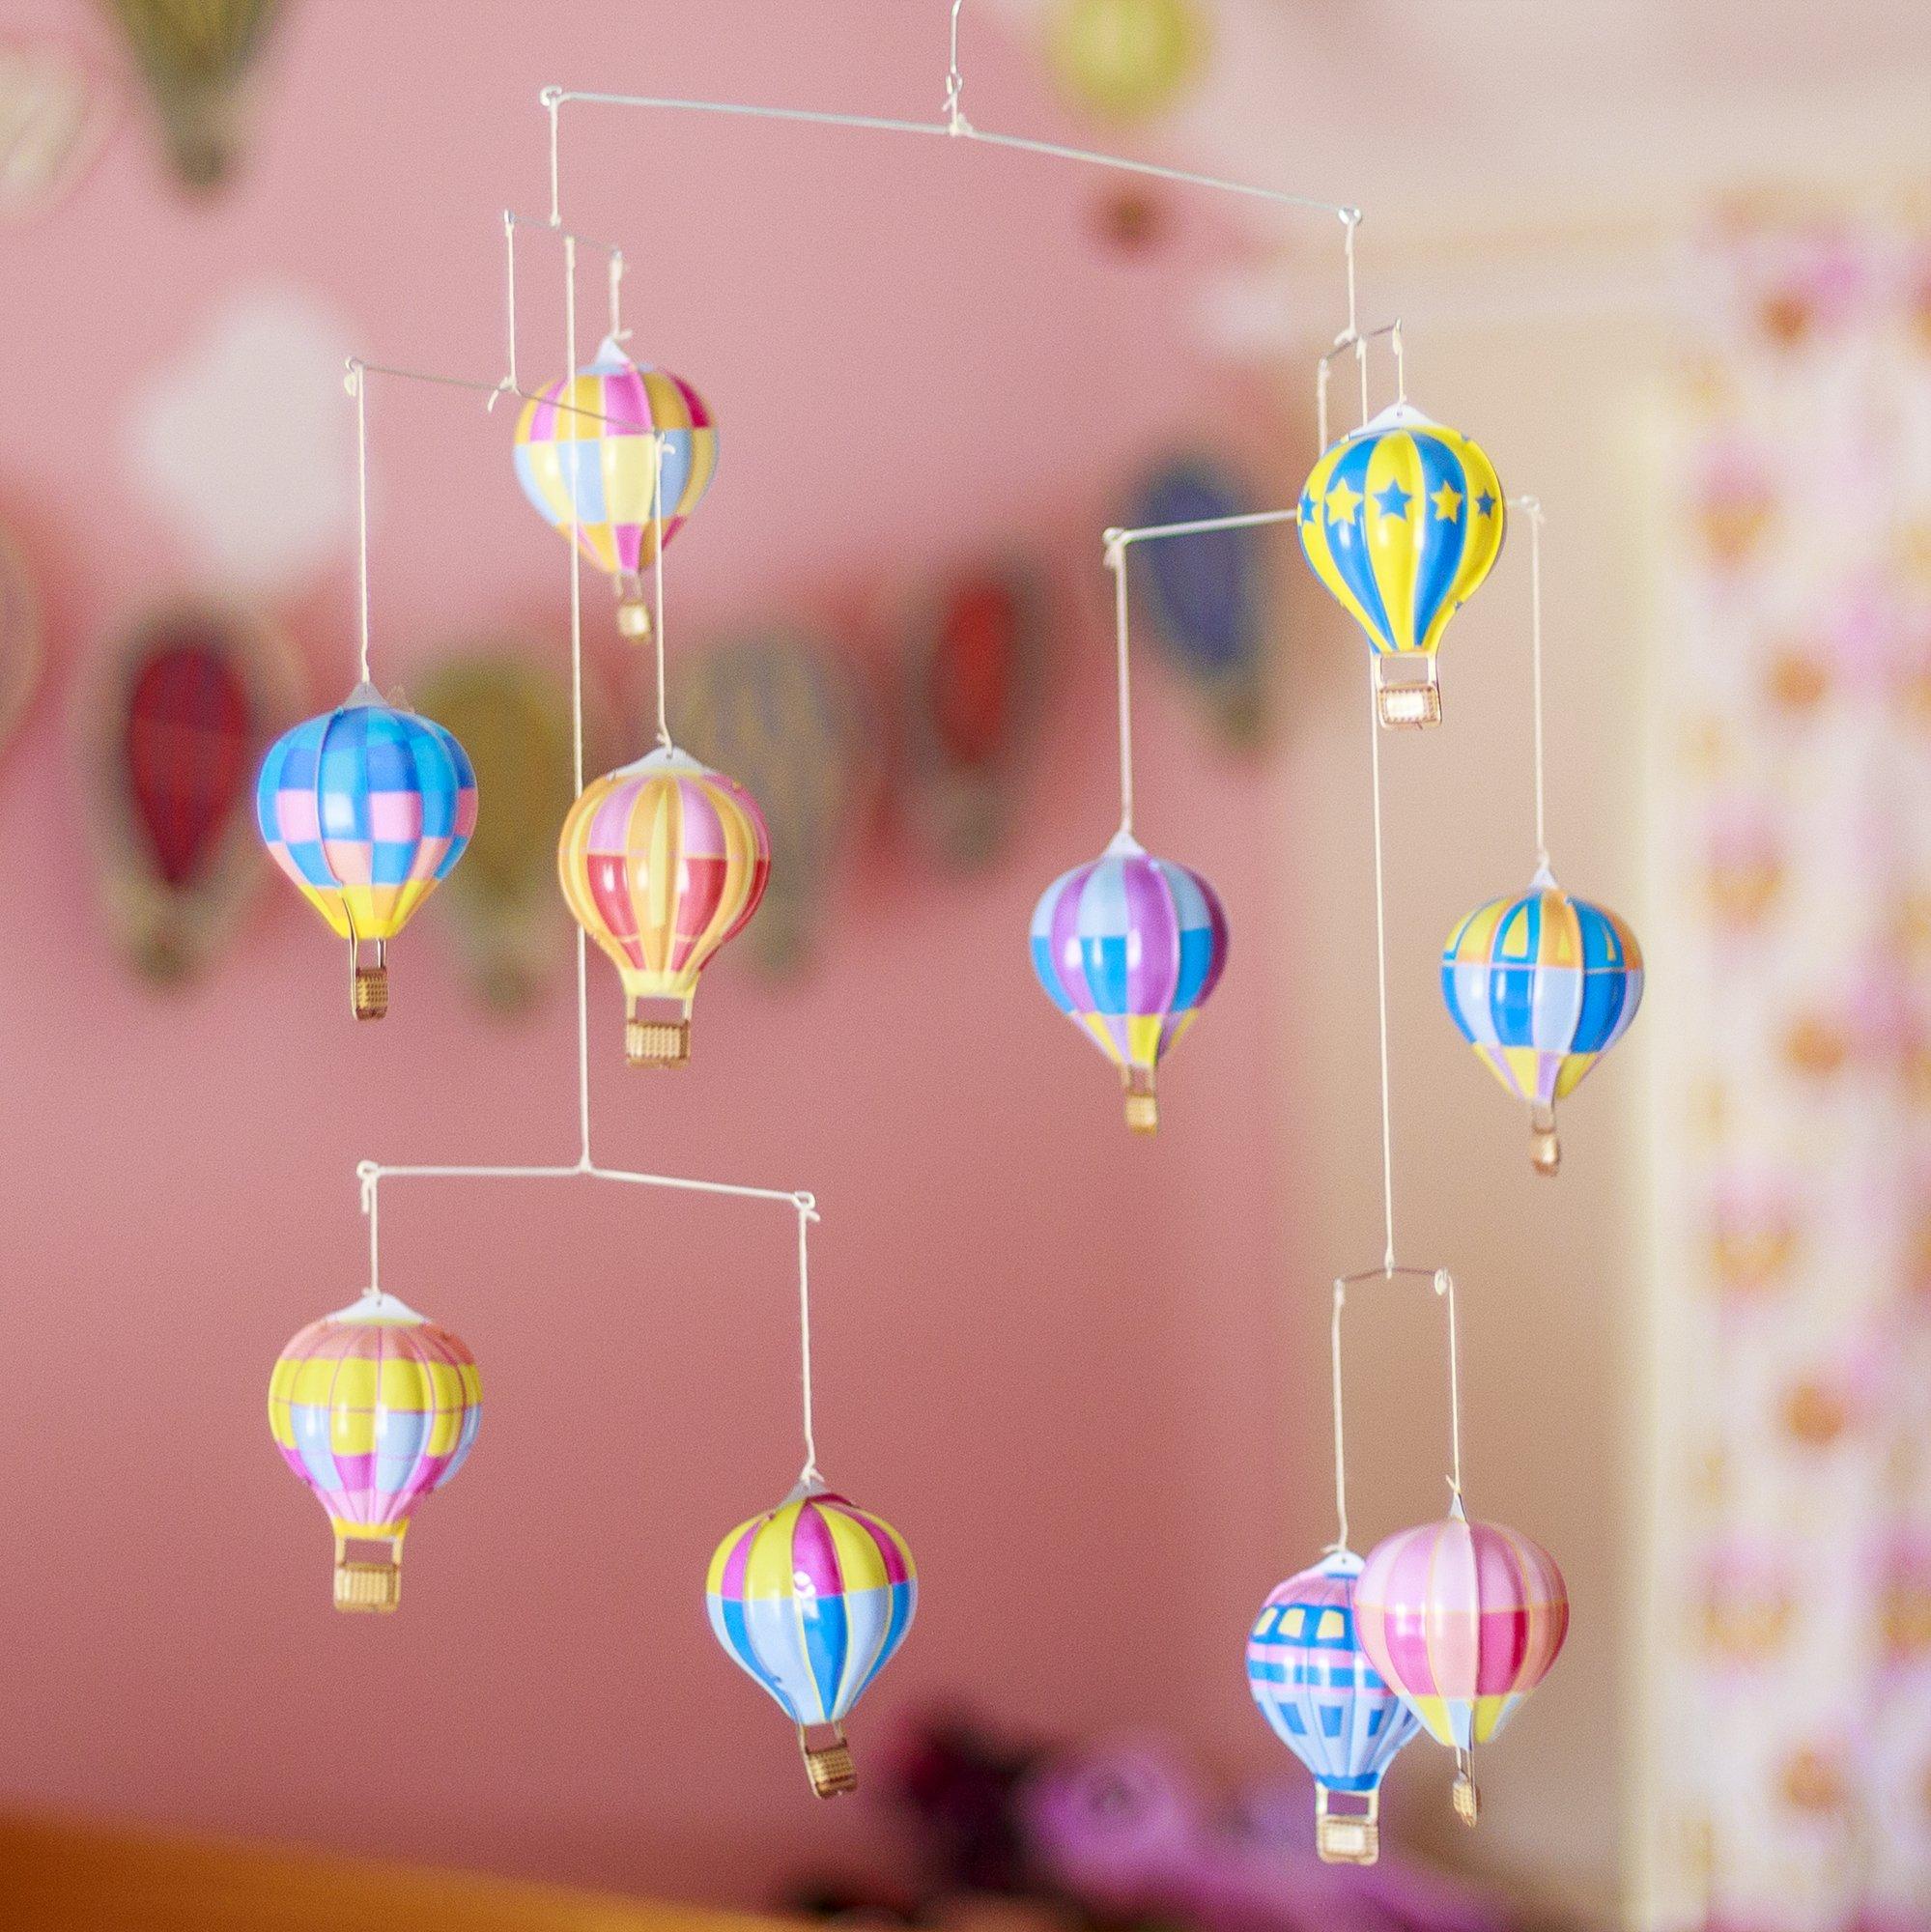 air light images fixture balloon vehicle aircraft free hot l chandelier pixball com ceiling